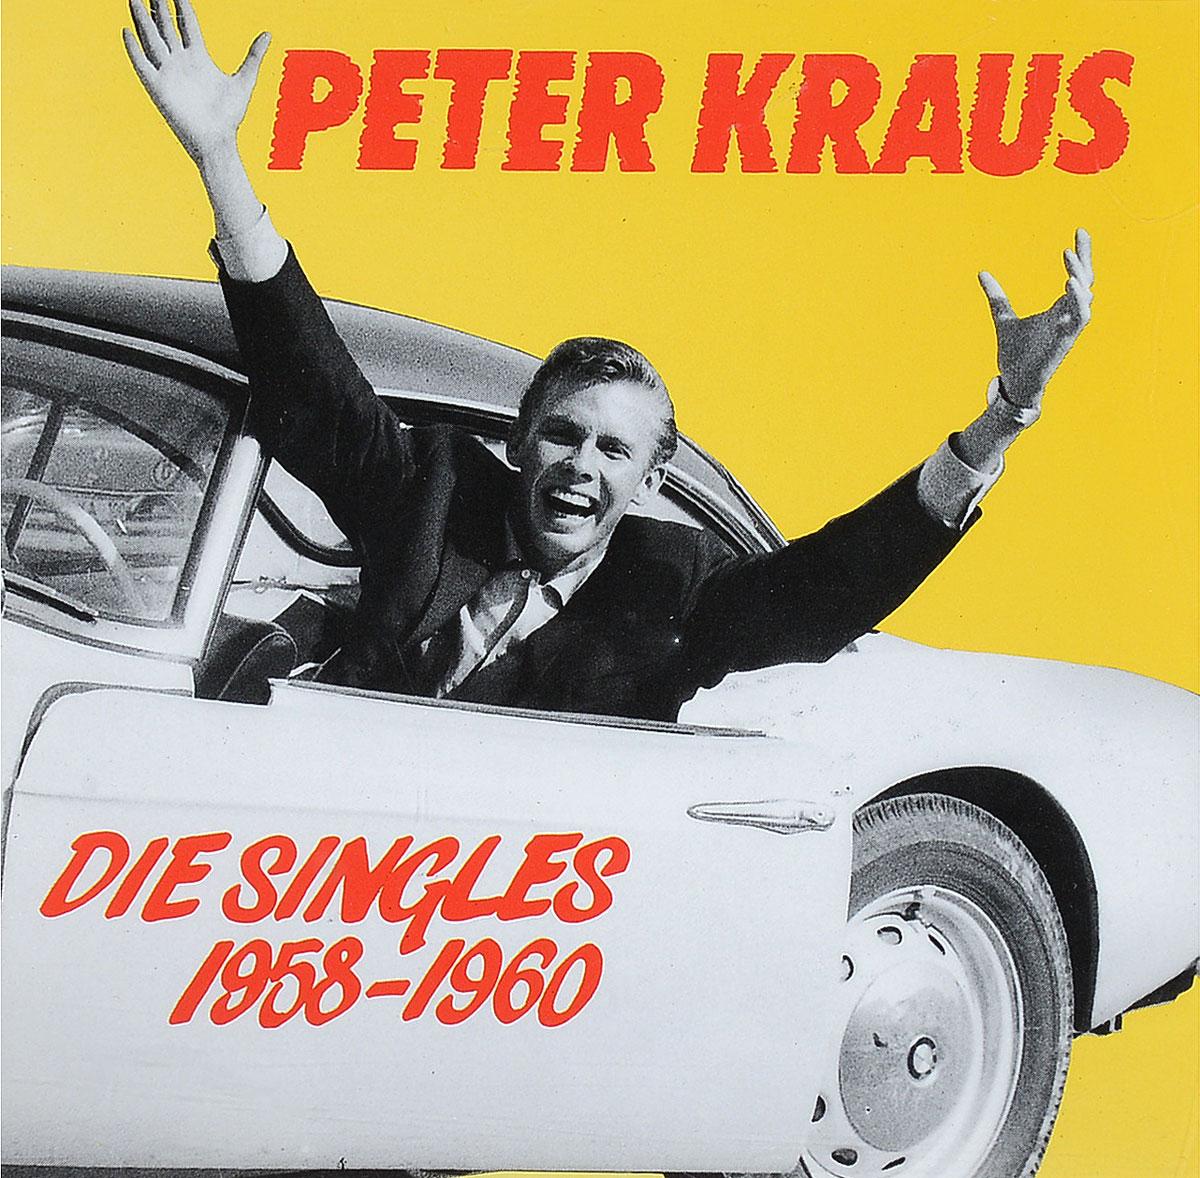 Peter Kraus. Singles 1958-60 (CD)